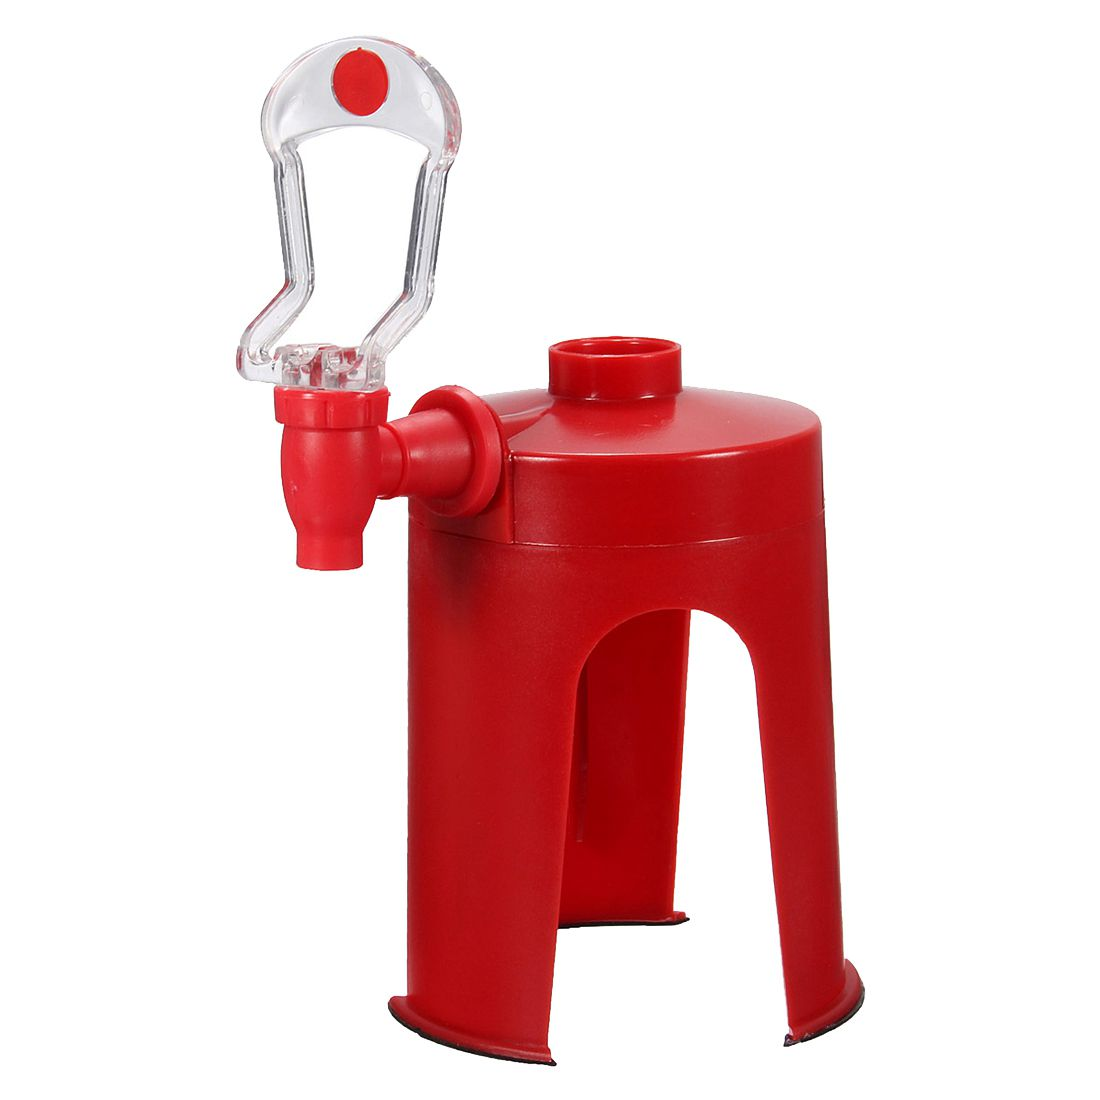 HOME-Soda Dispenser Fizz Dispenser Drink Dispenser Water Dispenser Party Cola Sprite, RedHOME-Soda Dispenser Fizz Dispenser Drink Dispenser Water Dispenser Party Cola Sprite, Red